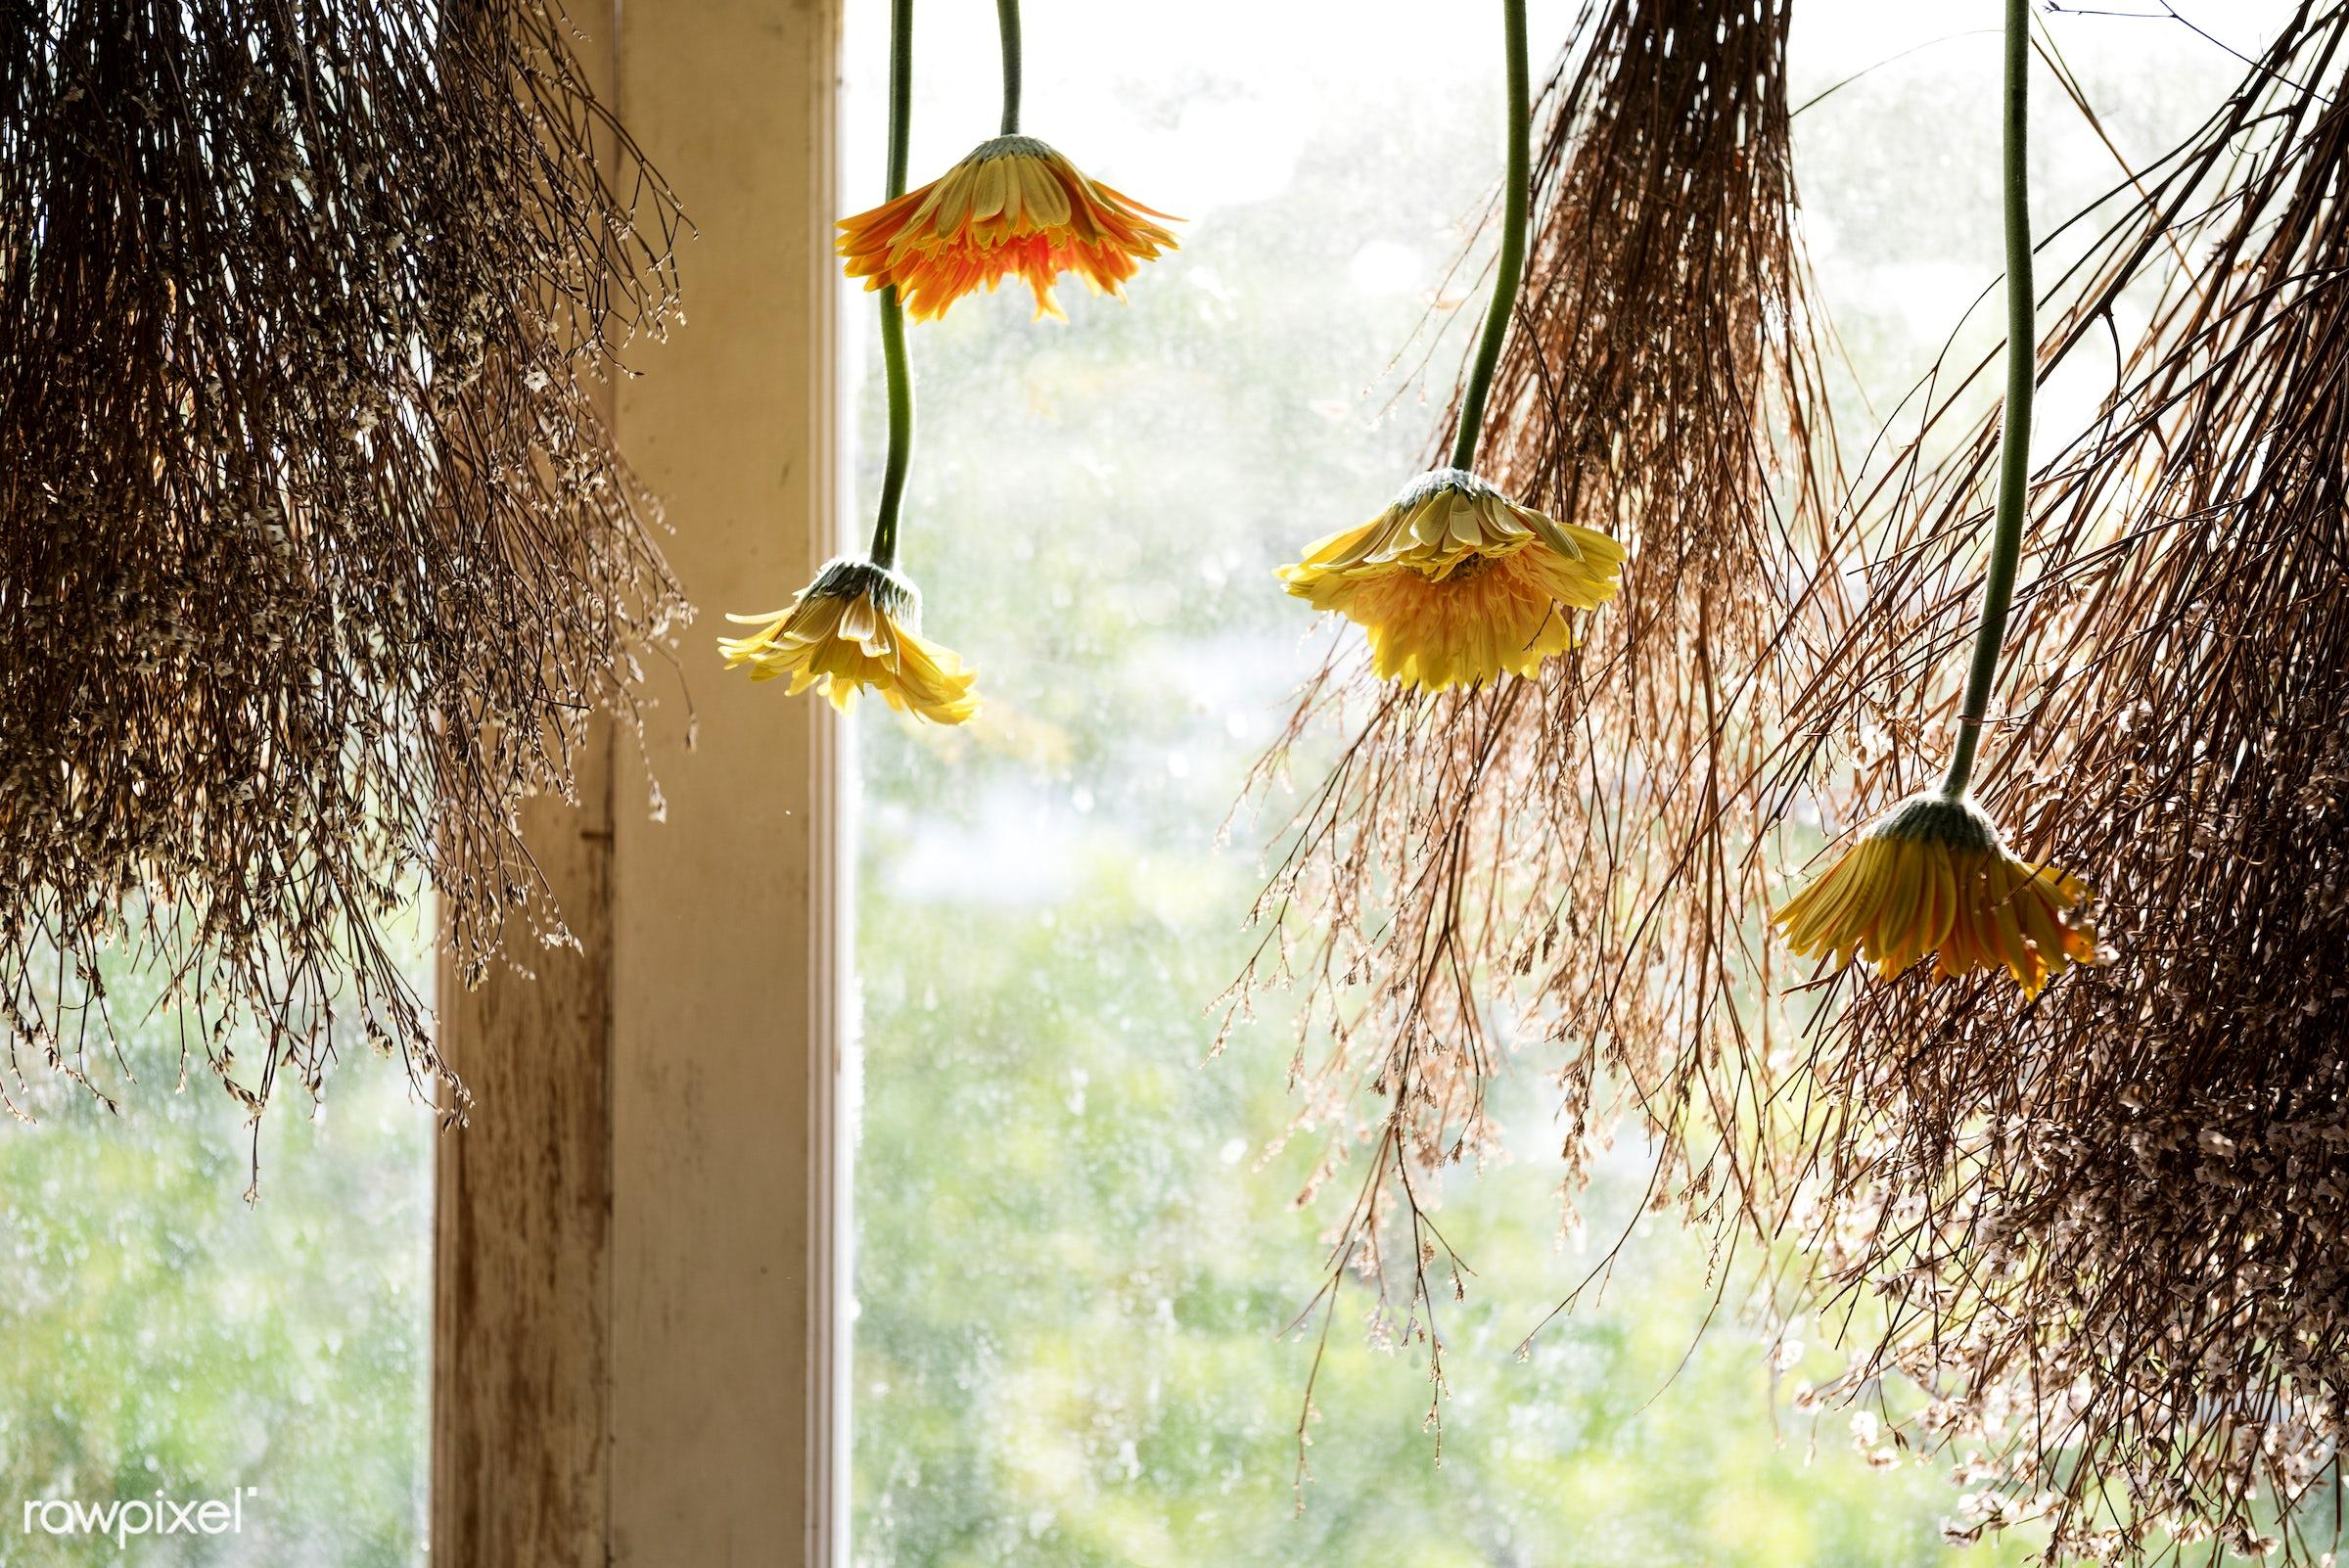 Flowers hanging in a window - plant, bouquet, shop, concept, decorative, botany, leaf, botanical, romance, blossom, decor,...